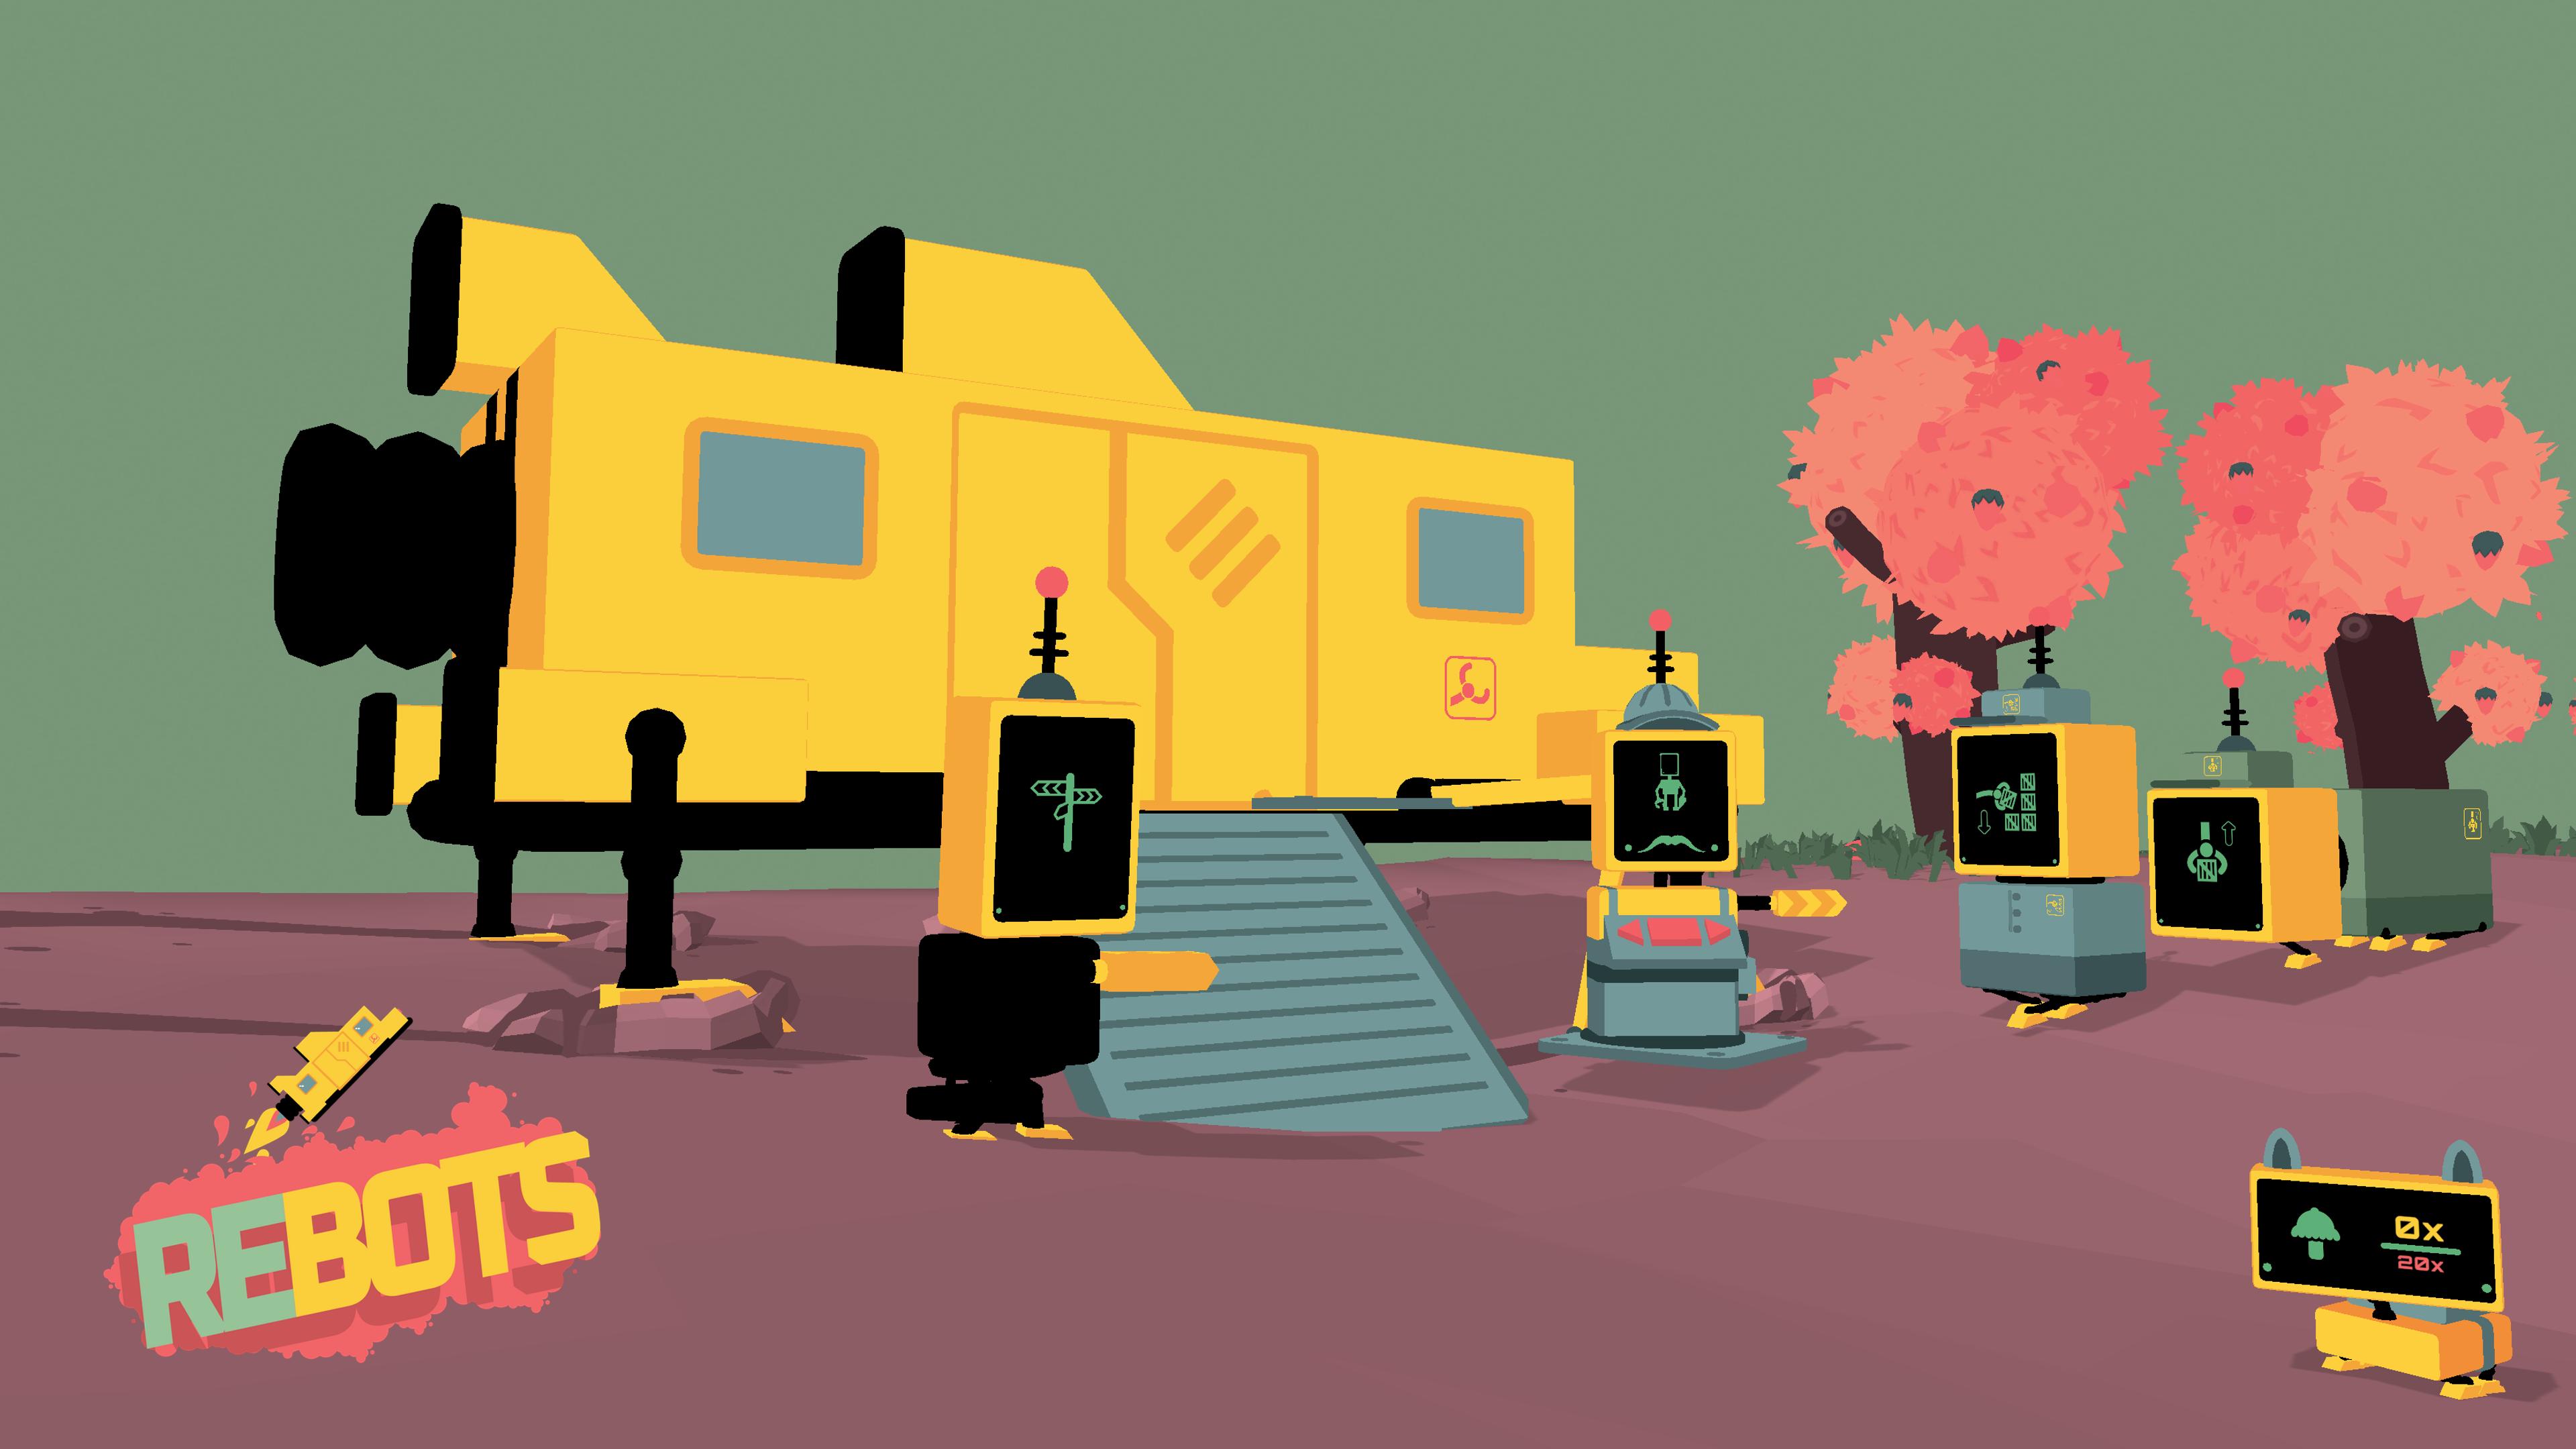 Screenshot Rebots 6